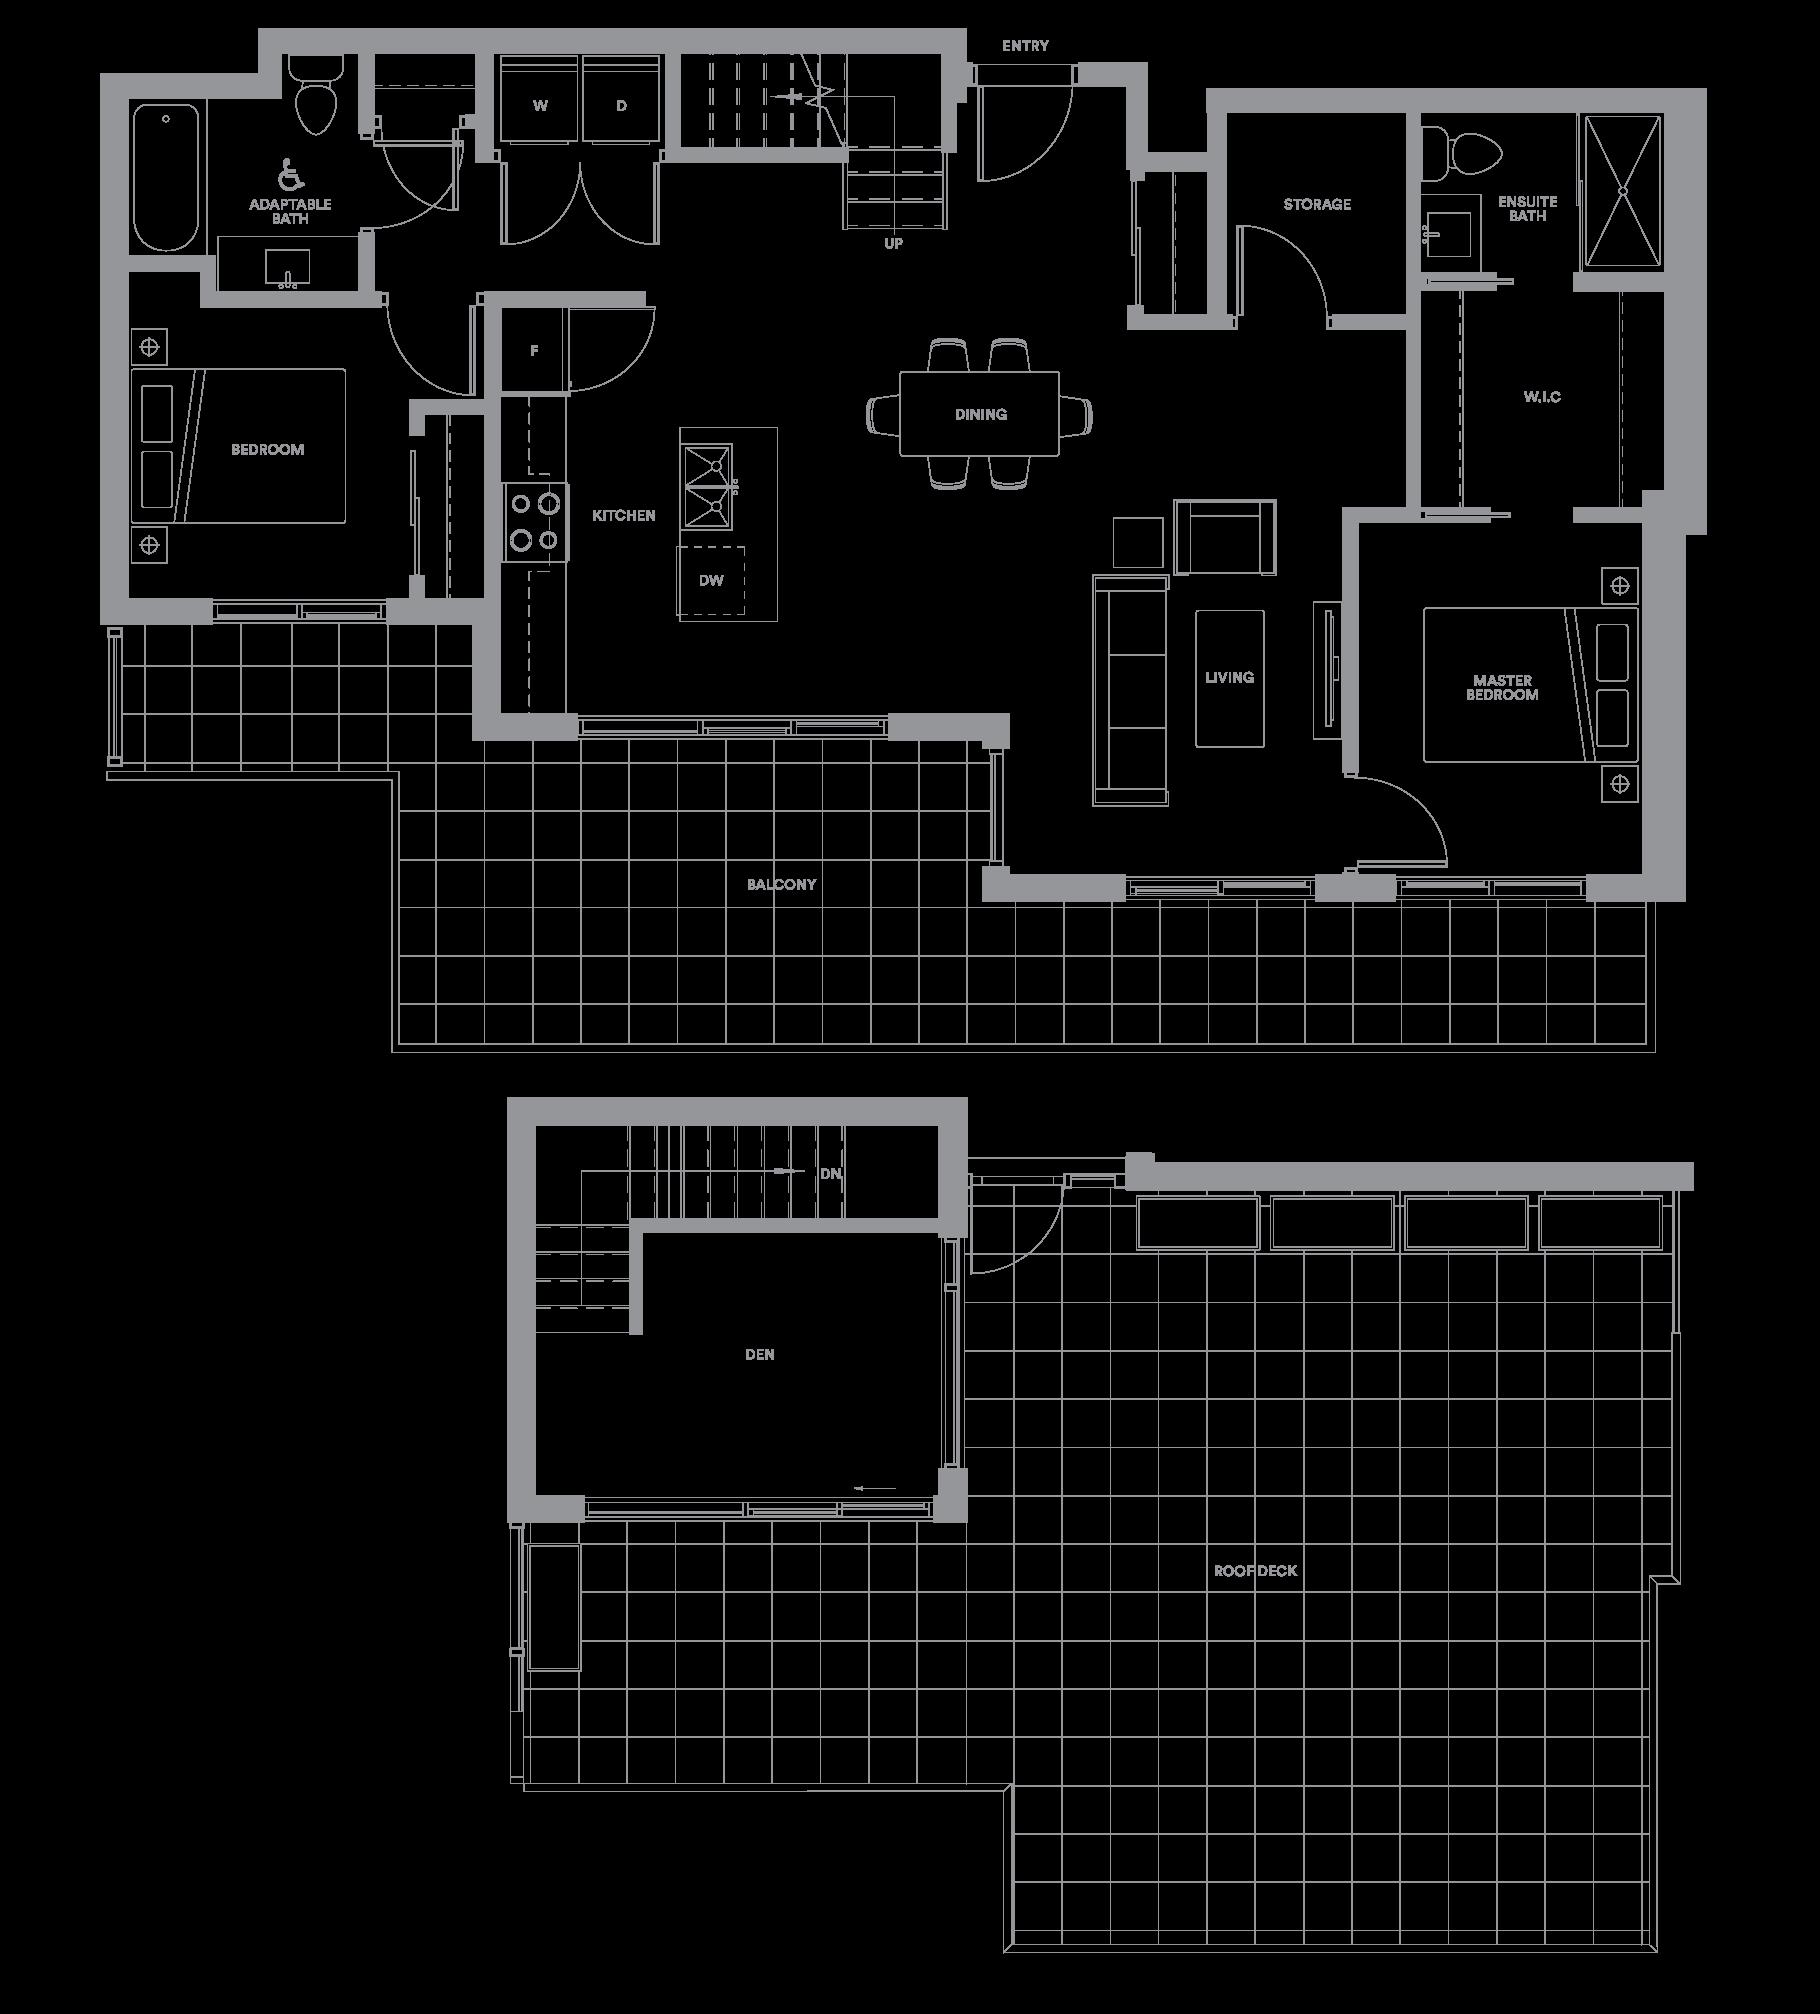 Synchro plan m 502